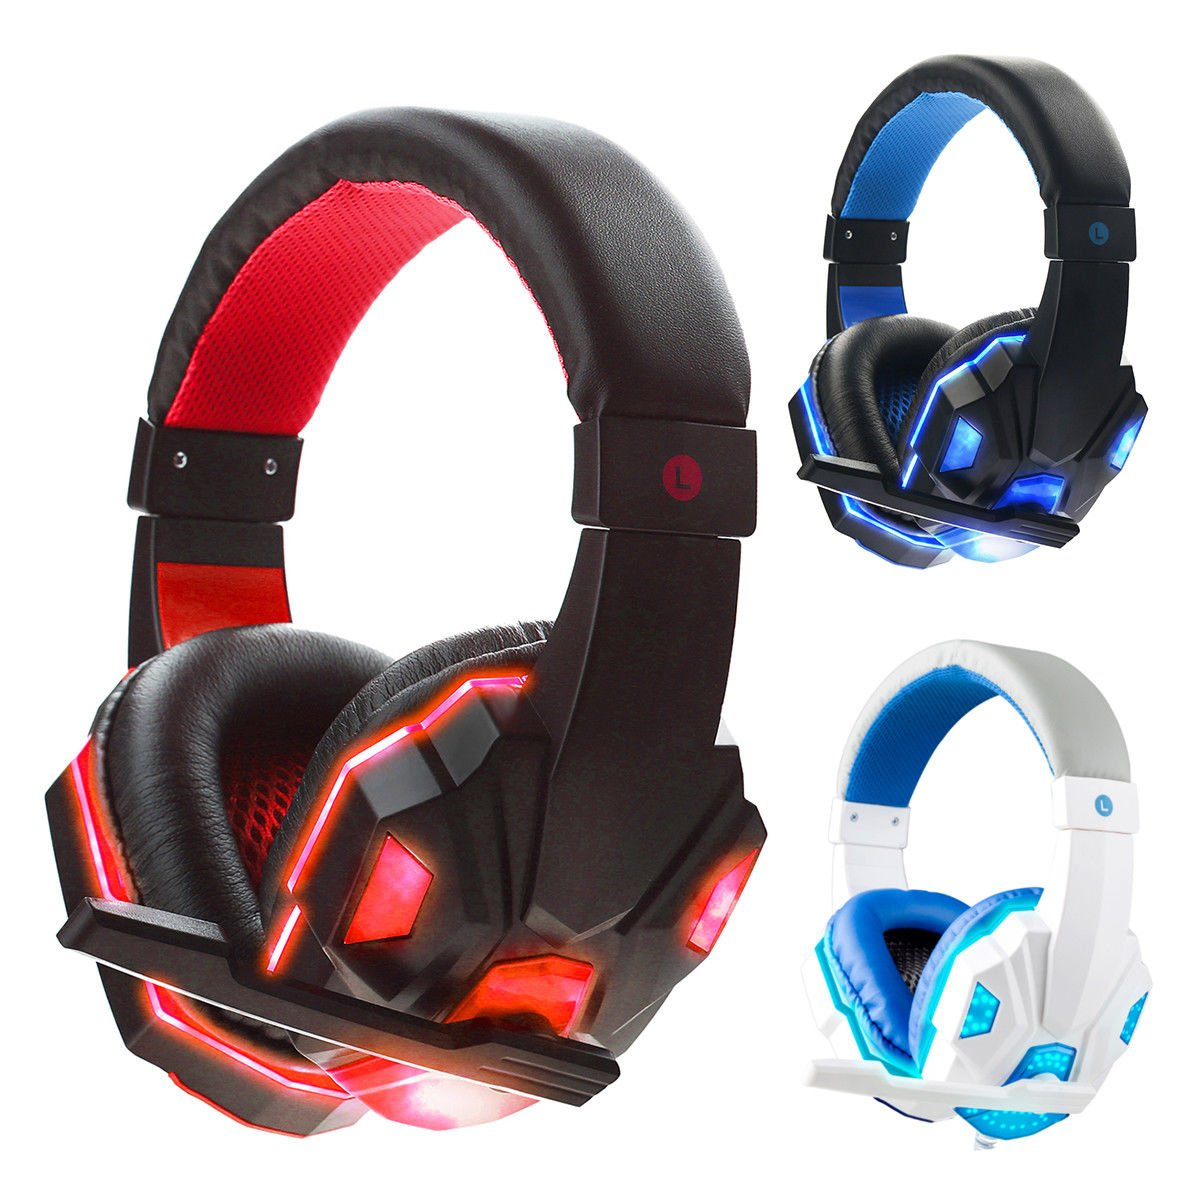 SY830MV Deep Bass Game Headphone Stereo Over-Ear Gaming Headset Headband Earphone with LED Light